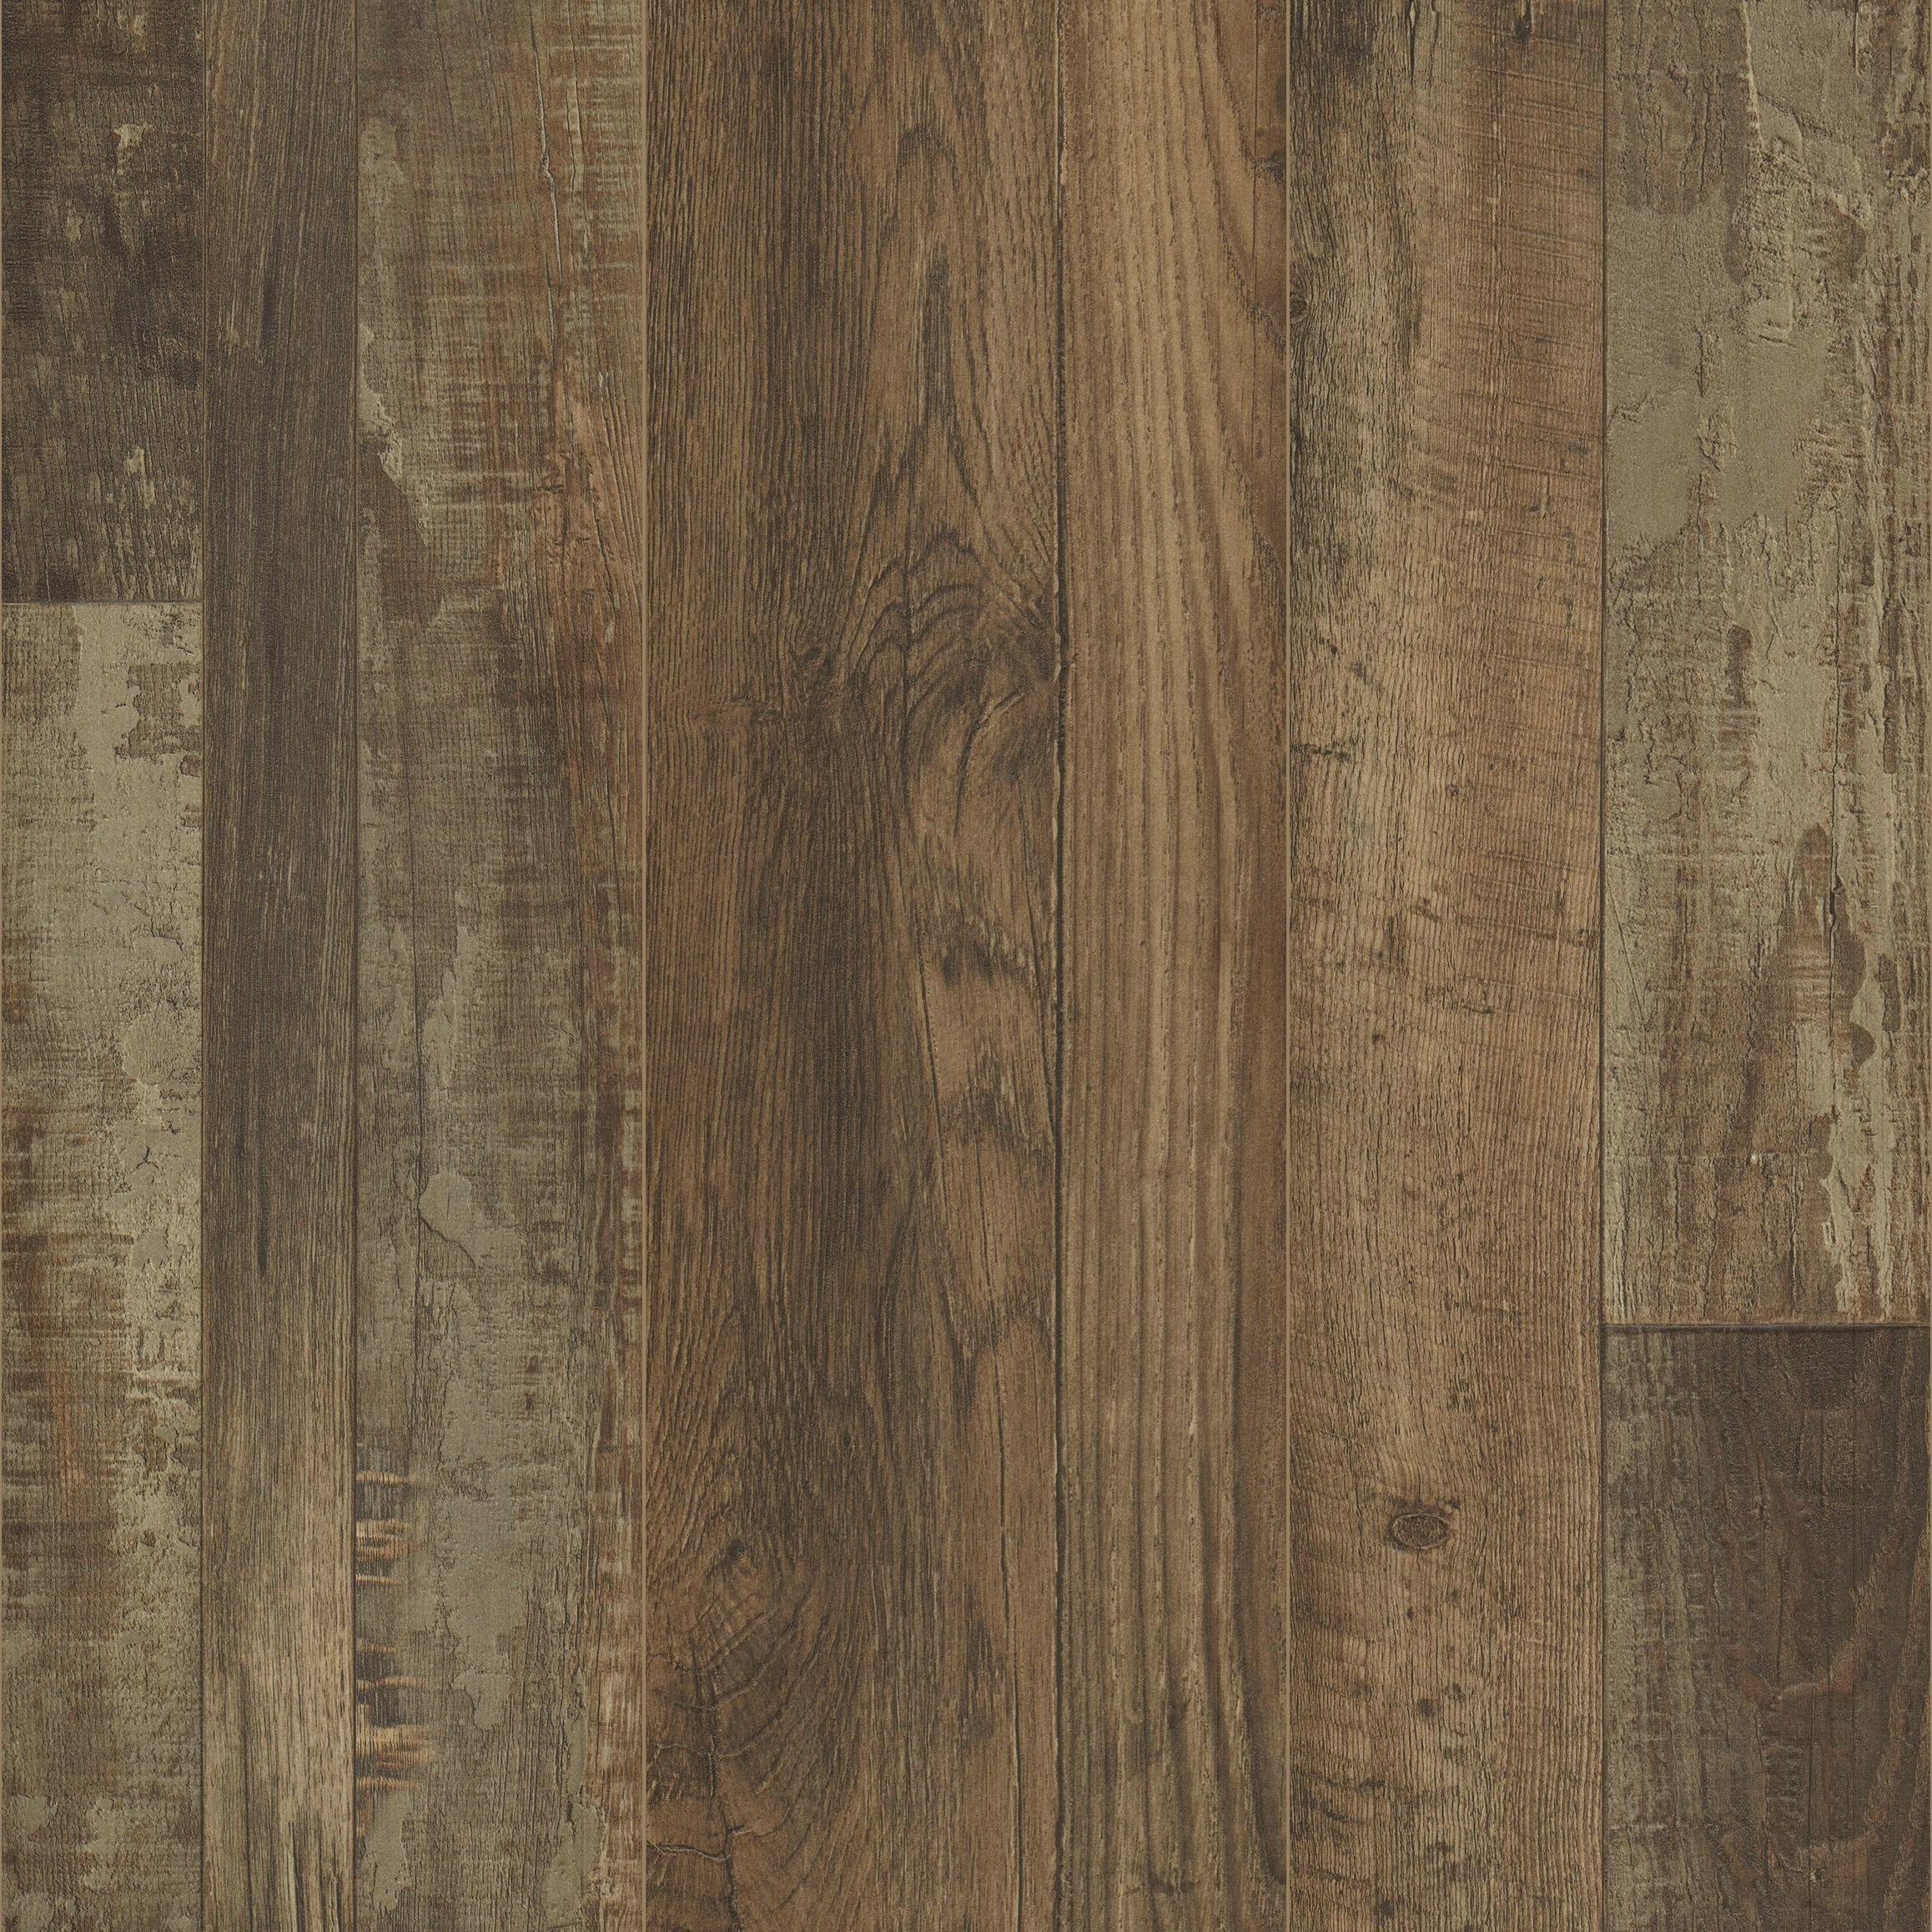 Uniboard Laminate Floor Walesfootprint Org